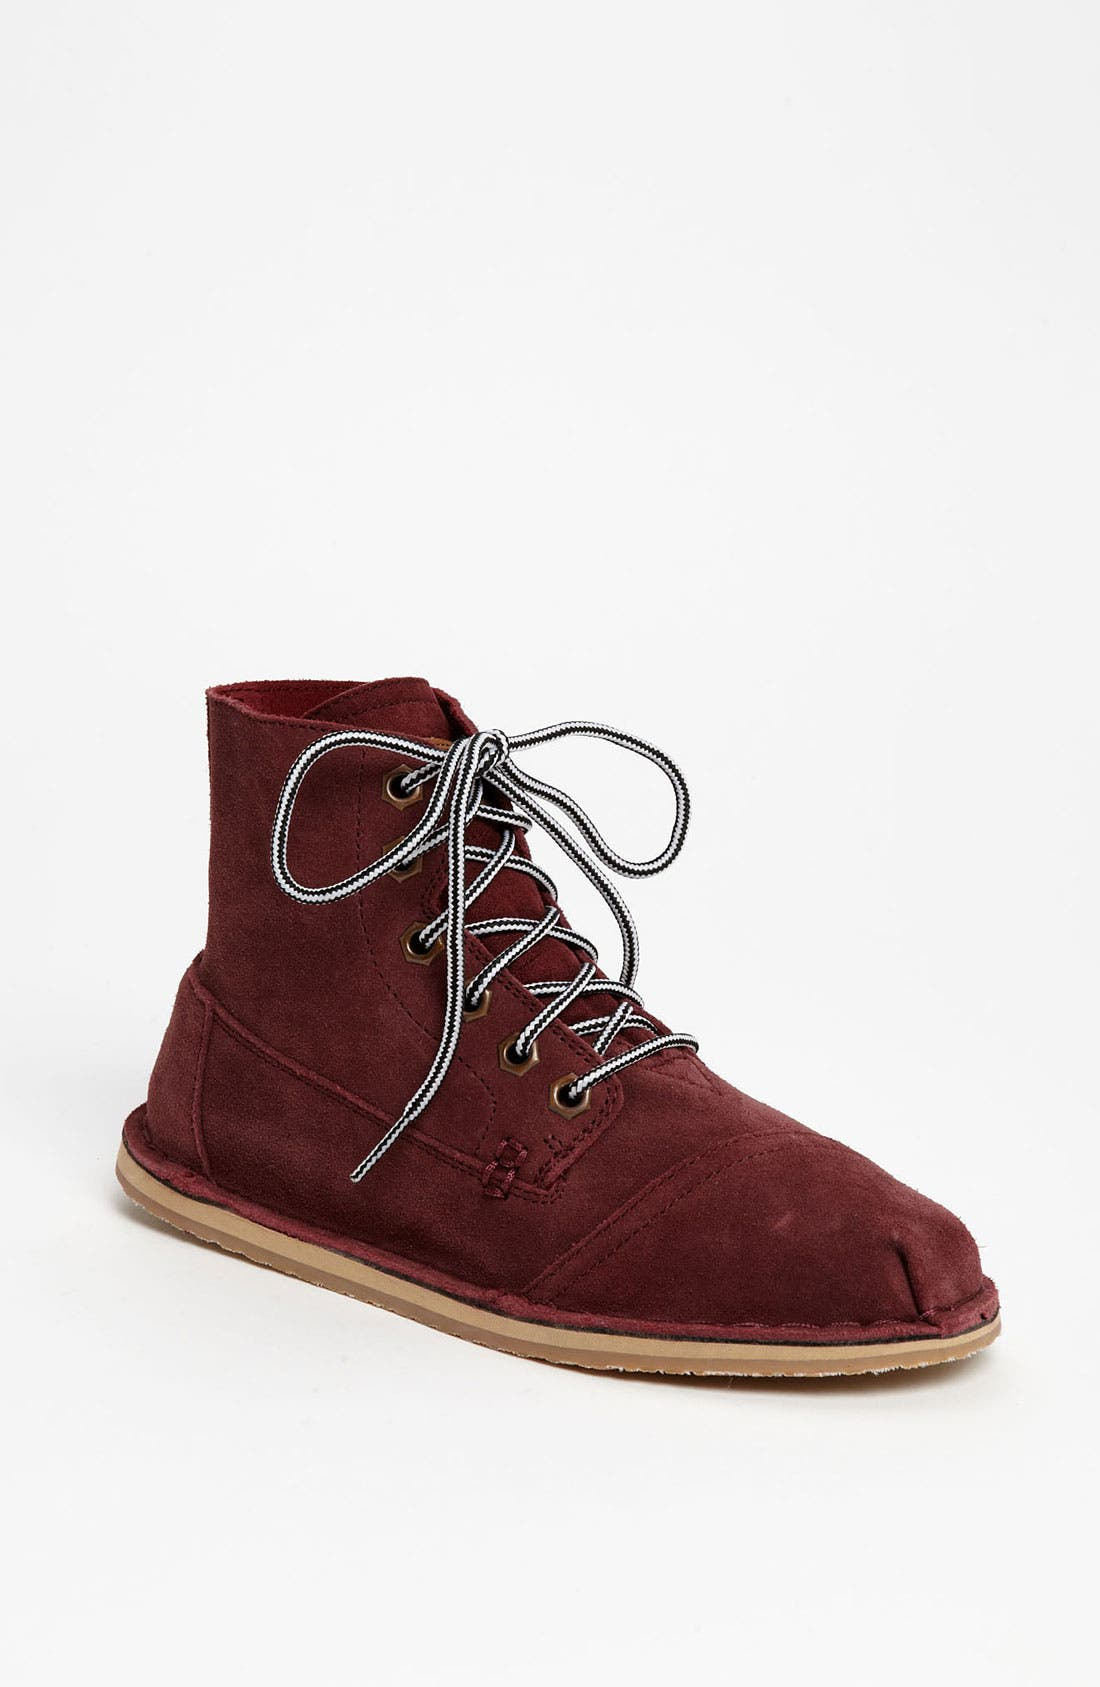 Main Image - TOMS 'Tomboy' Boot (Women)